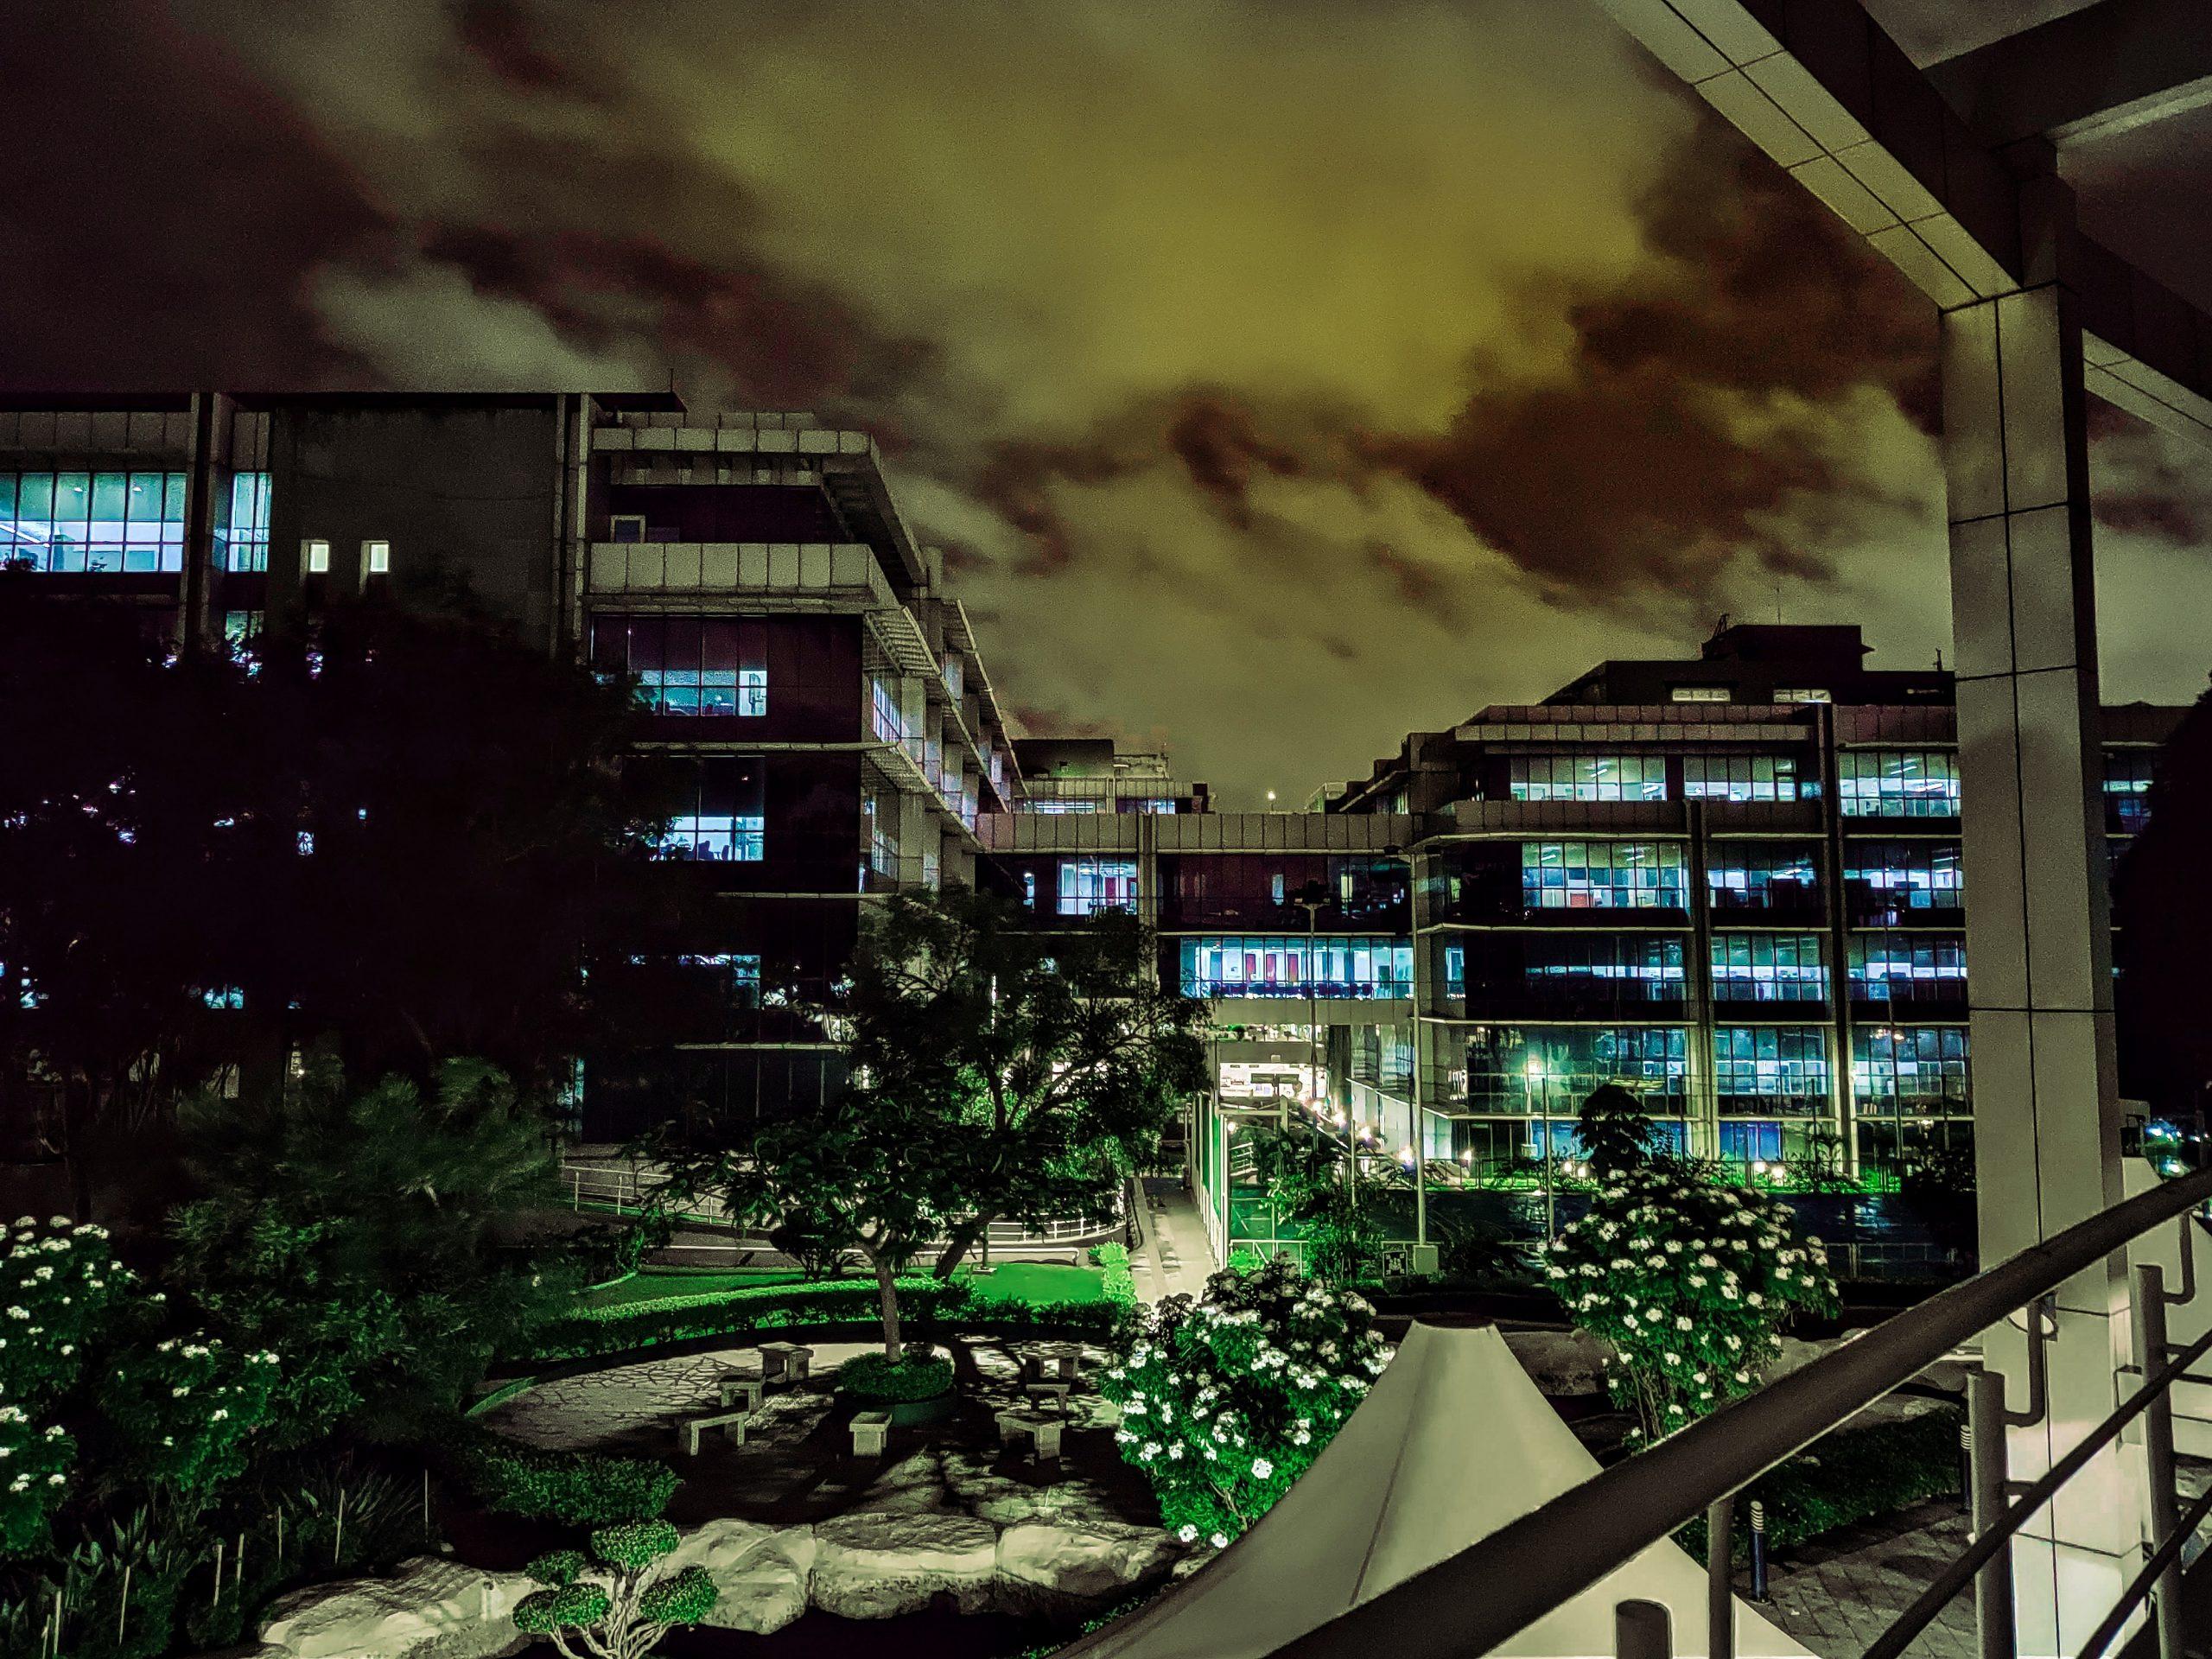 Penthouse Apartment at Night